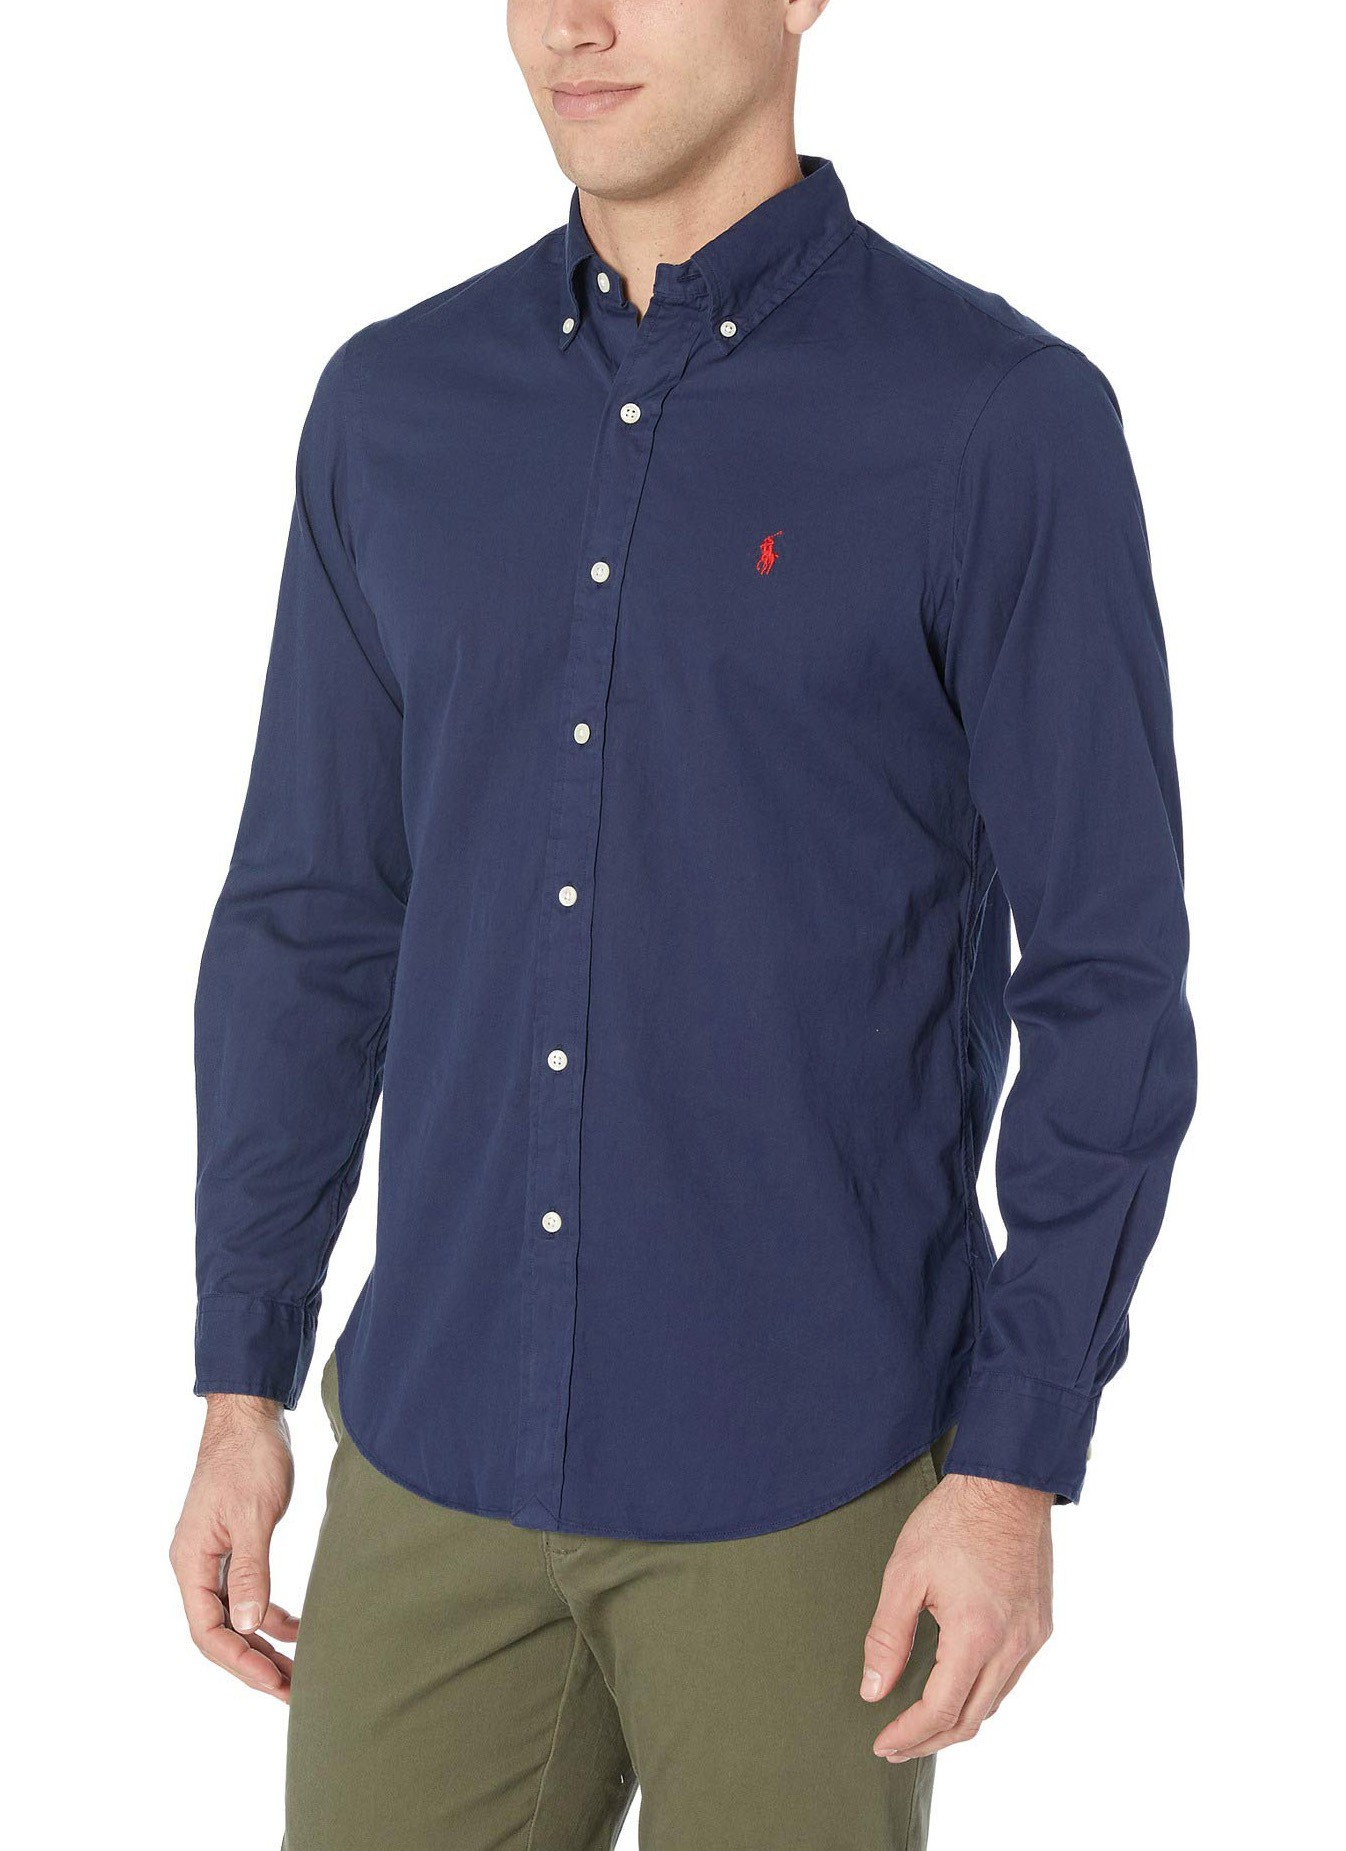 Camisa Ralph Lauren Masculina Custom Fit Oxford Azul Marinho